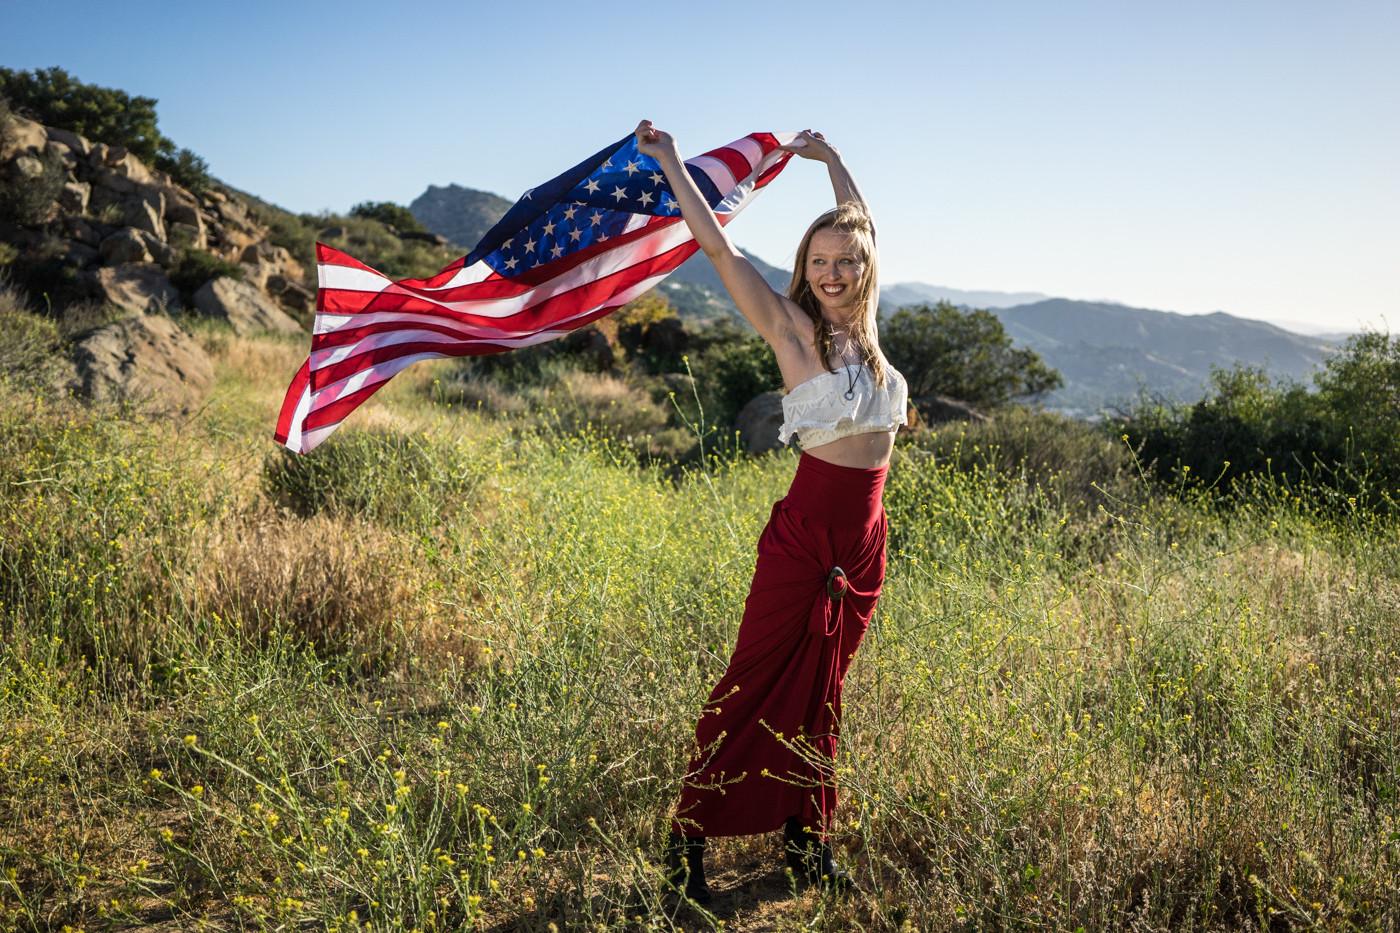 diana-patriotic-american-flag-red-skirt-simi-valley-california